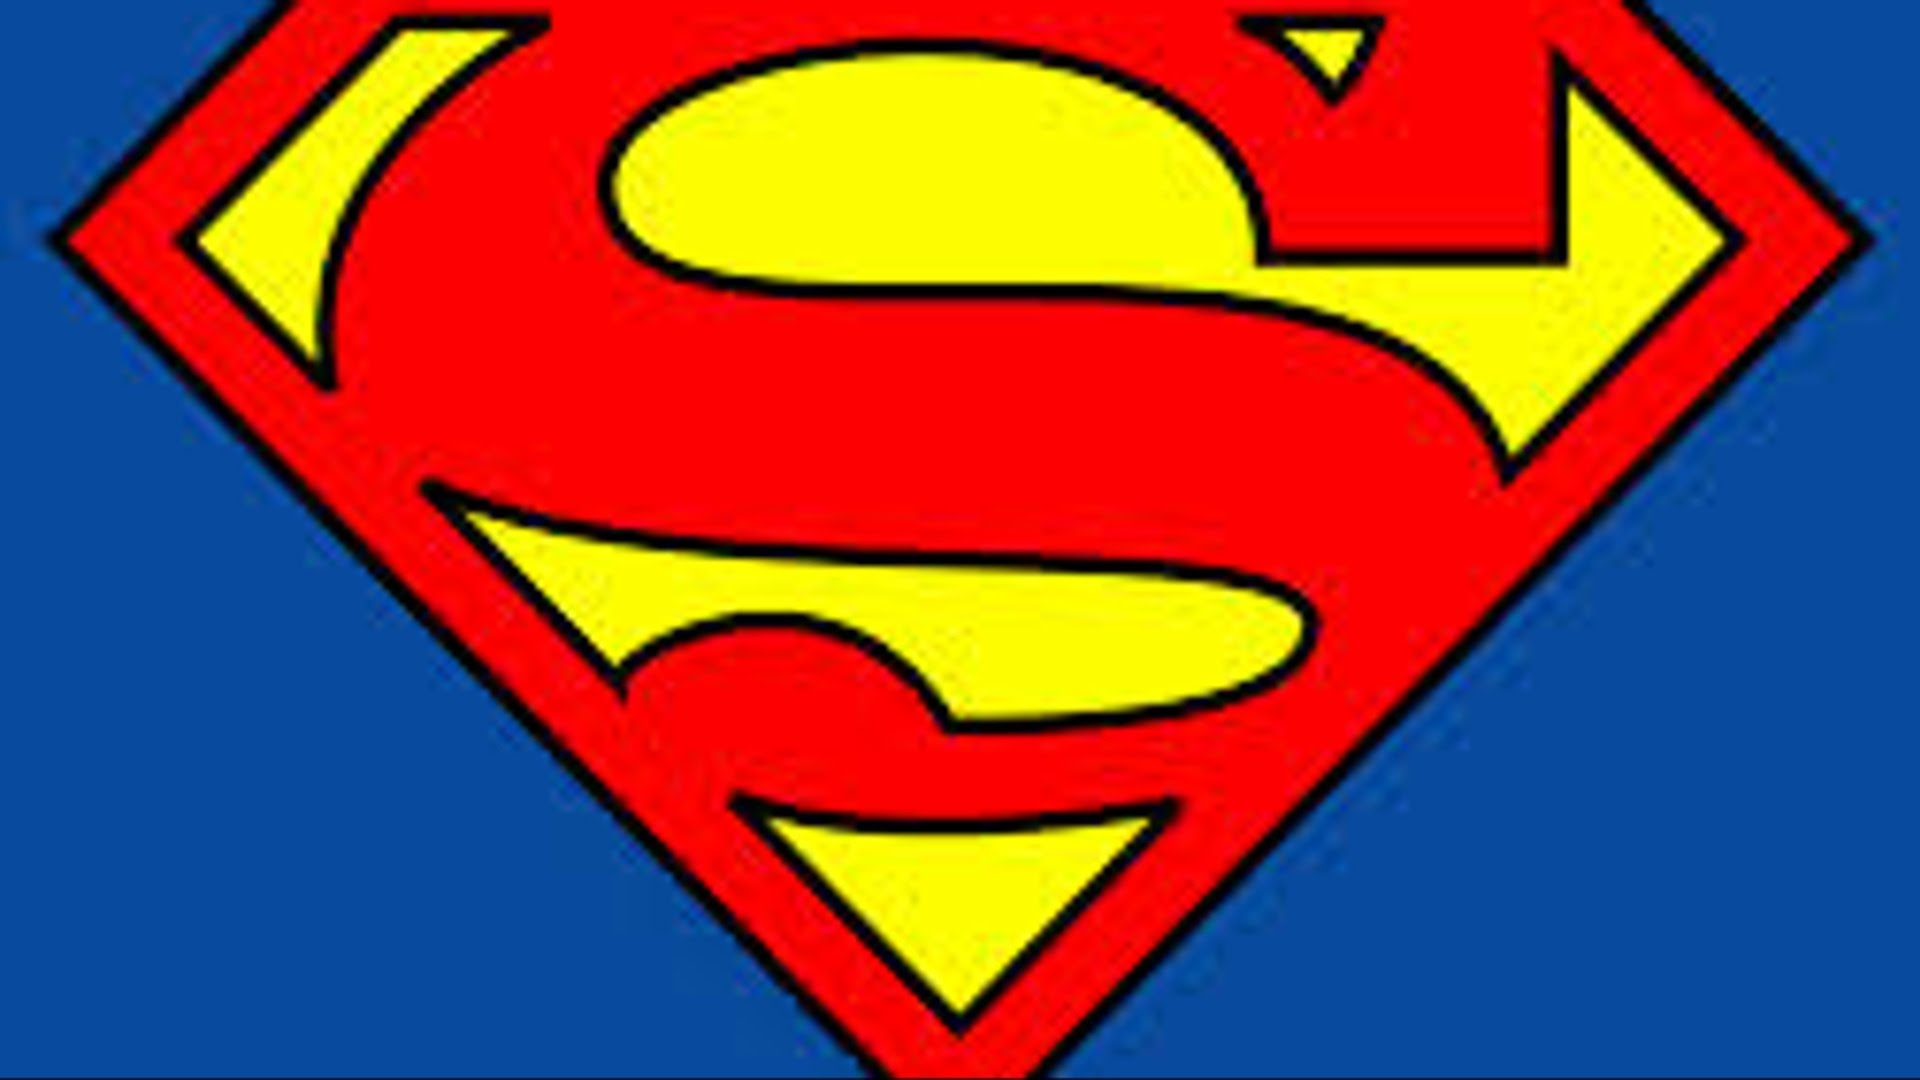 Superman Batman Symbol Wpmorganrlewis Cl-Superman Batman Symbol Wpmorganrlewis Clipart Free Clip Art-11